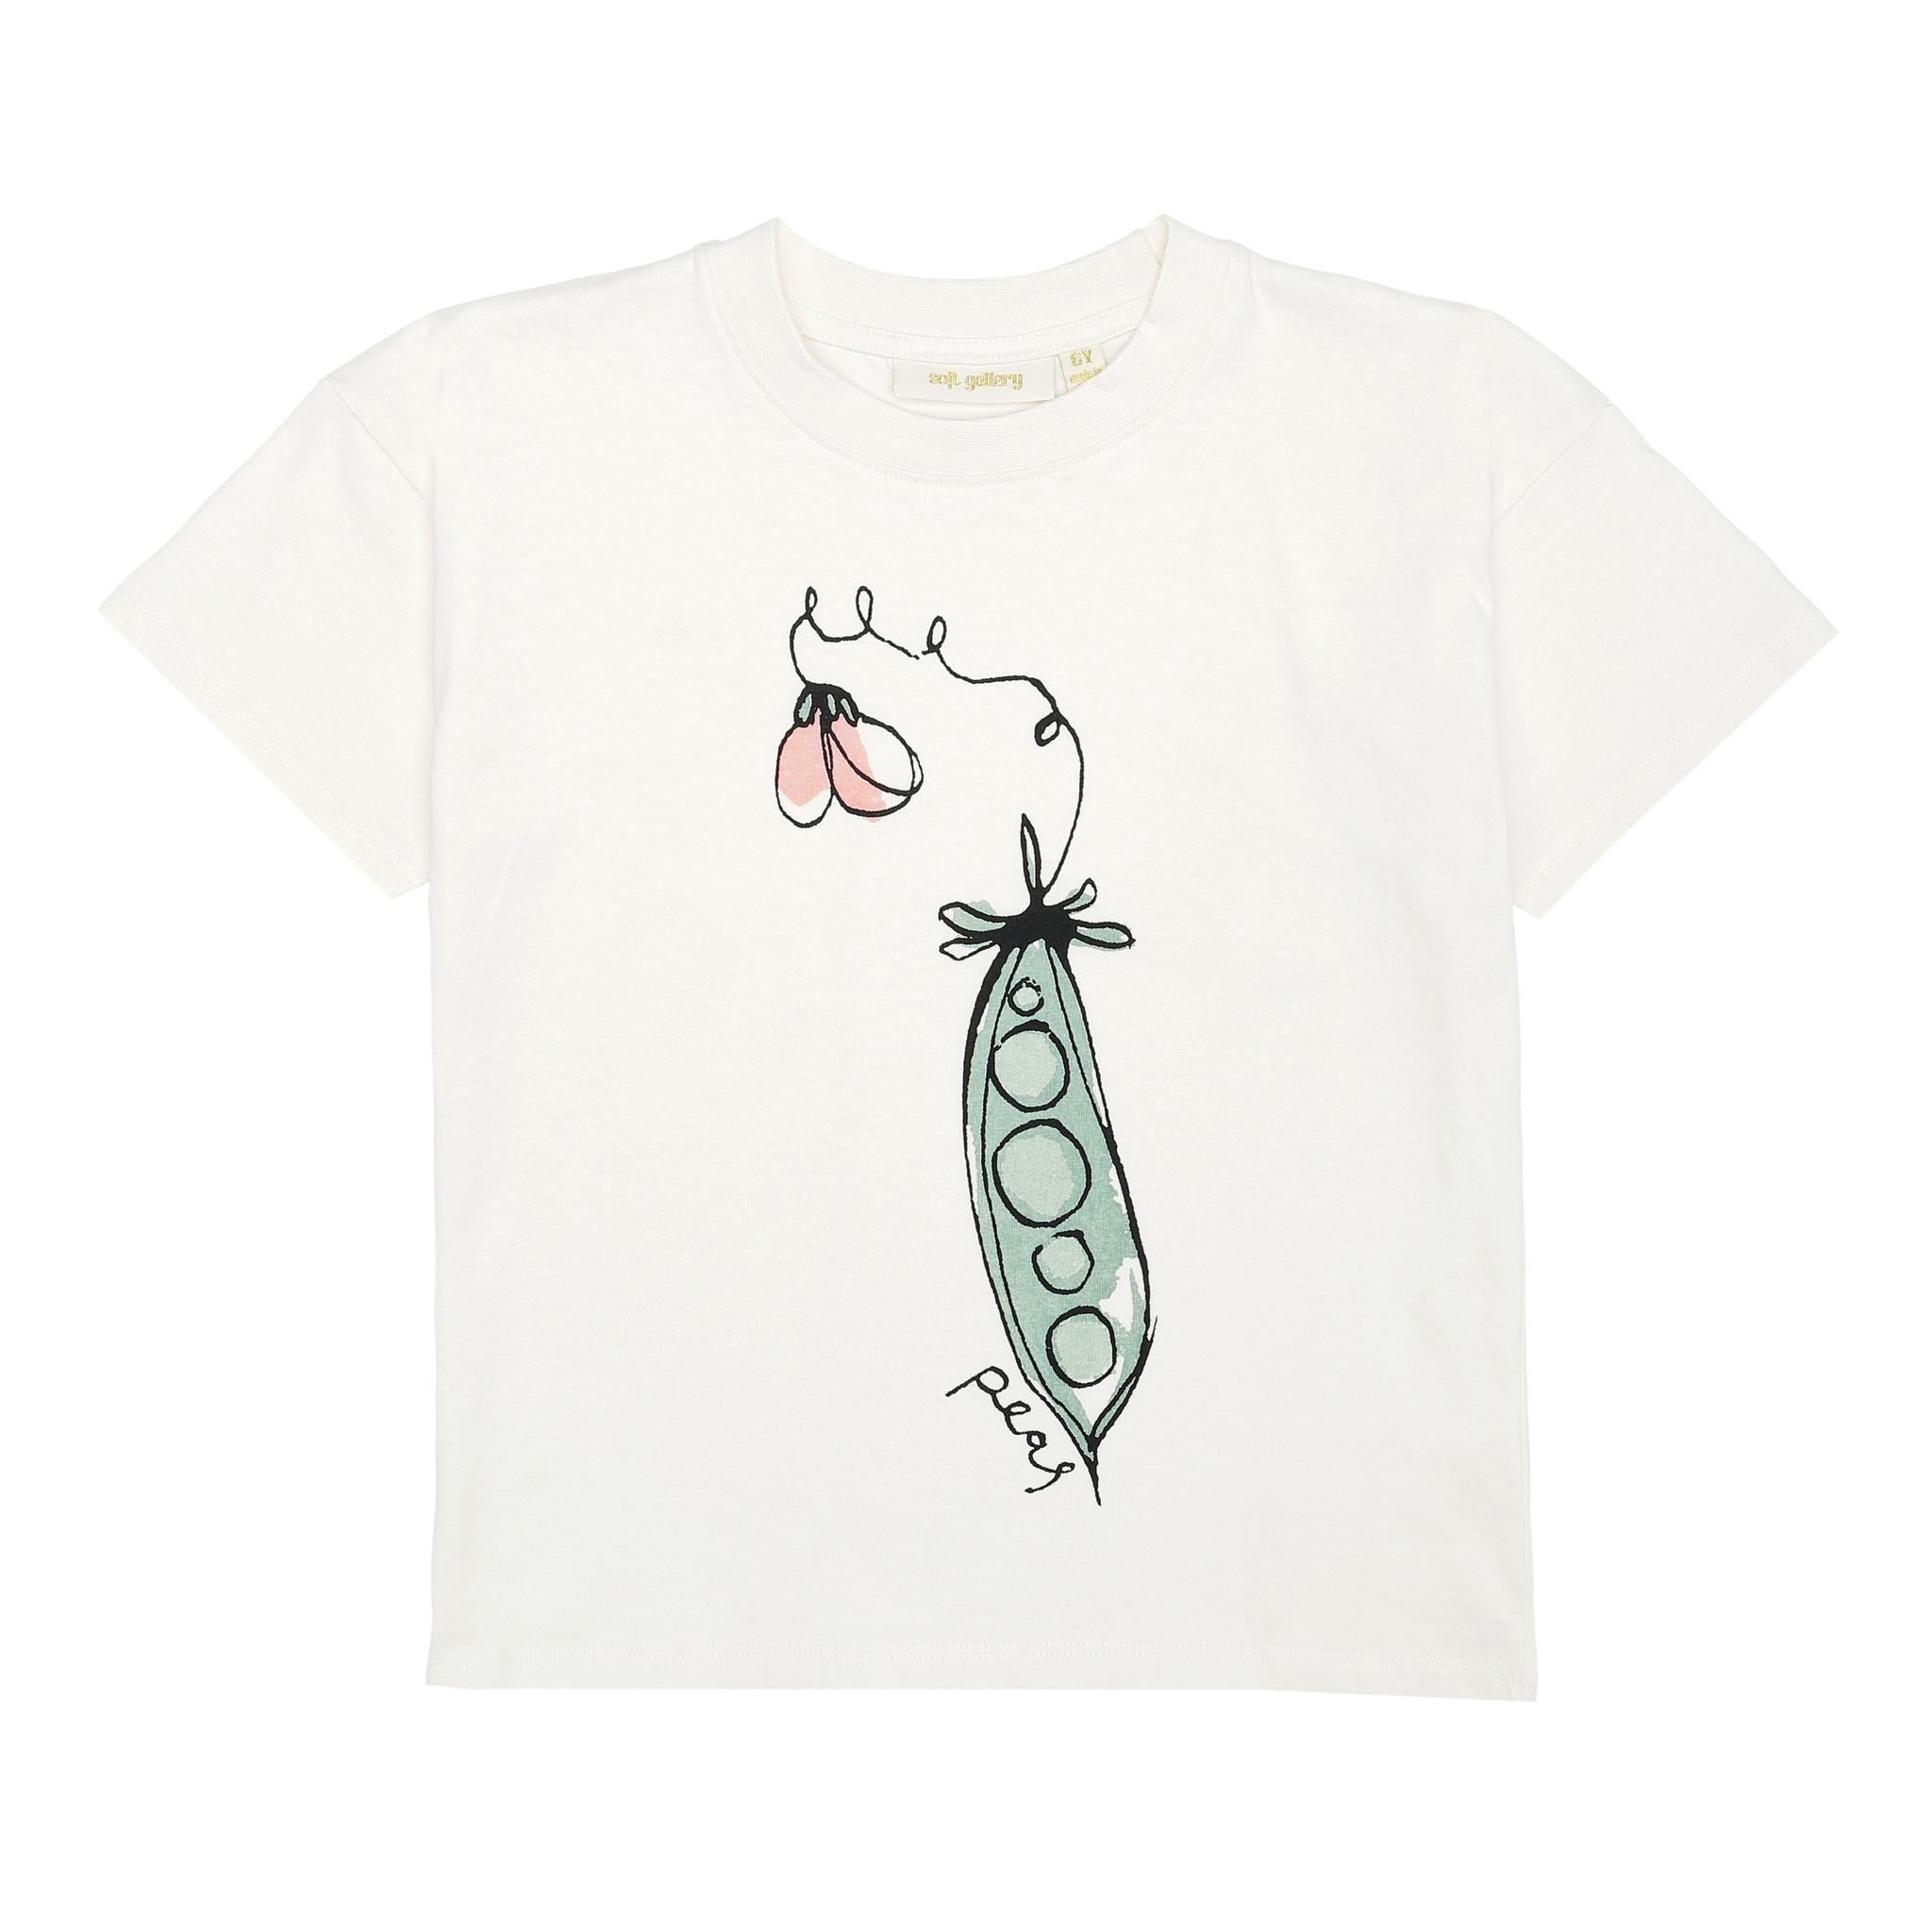 Dharma T-shirt - Gardenia / Peas-1